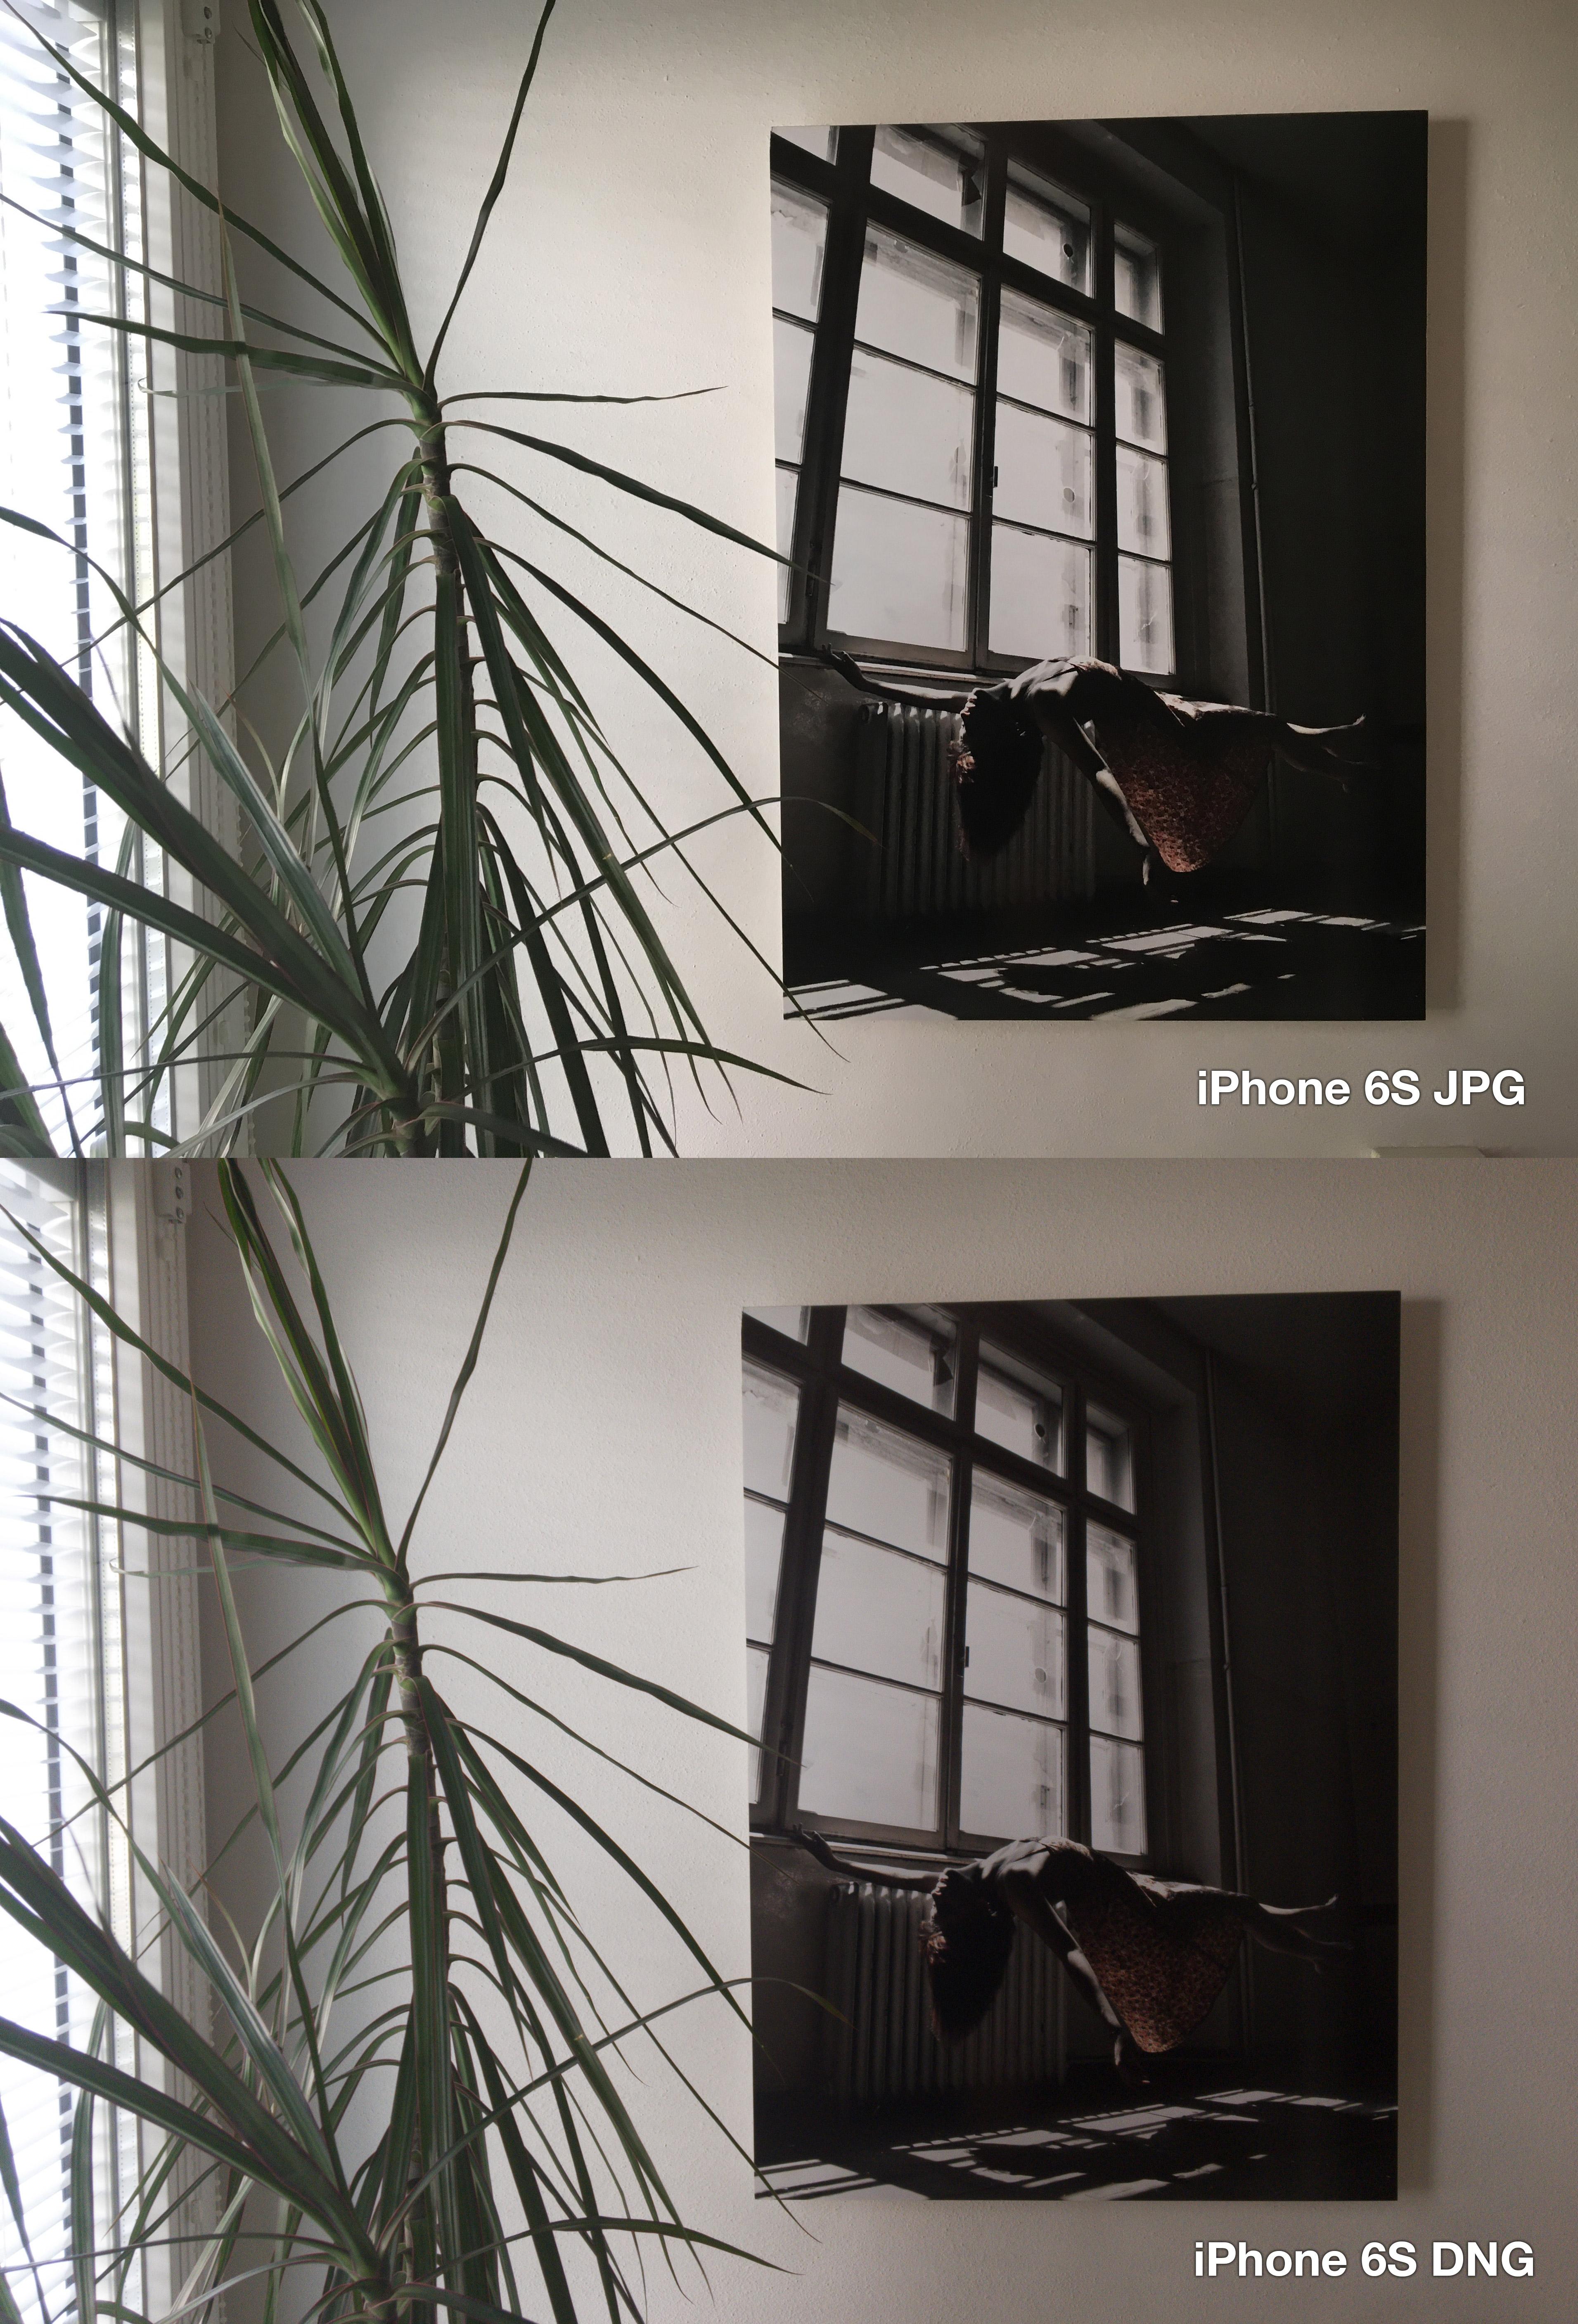 iphone-6s-lightroom-jpg-vs-dng-2